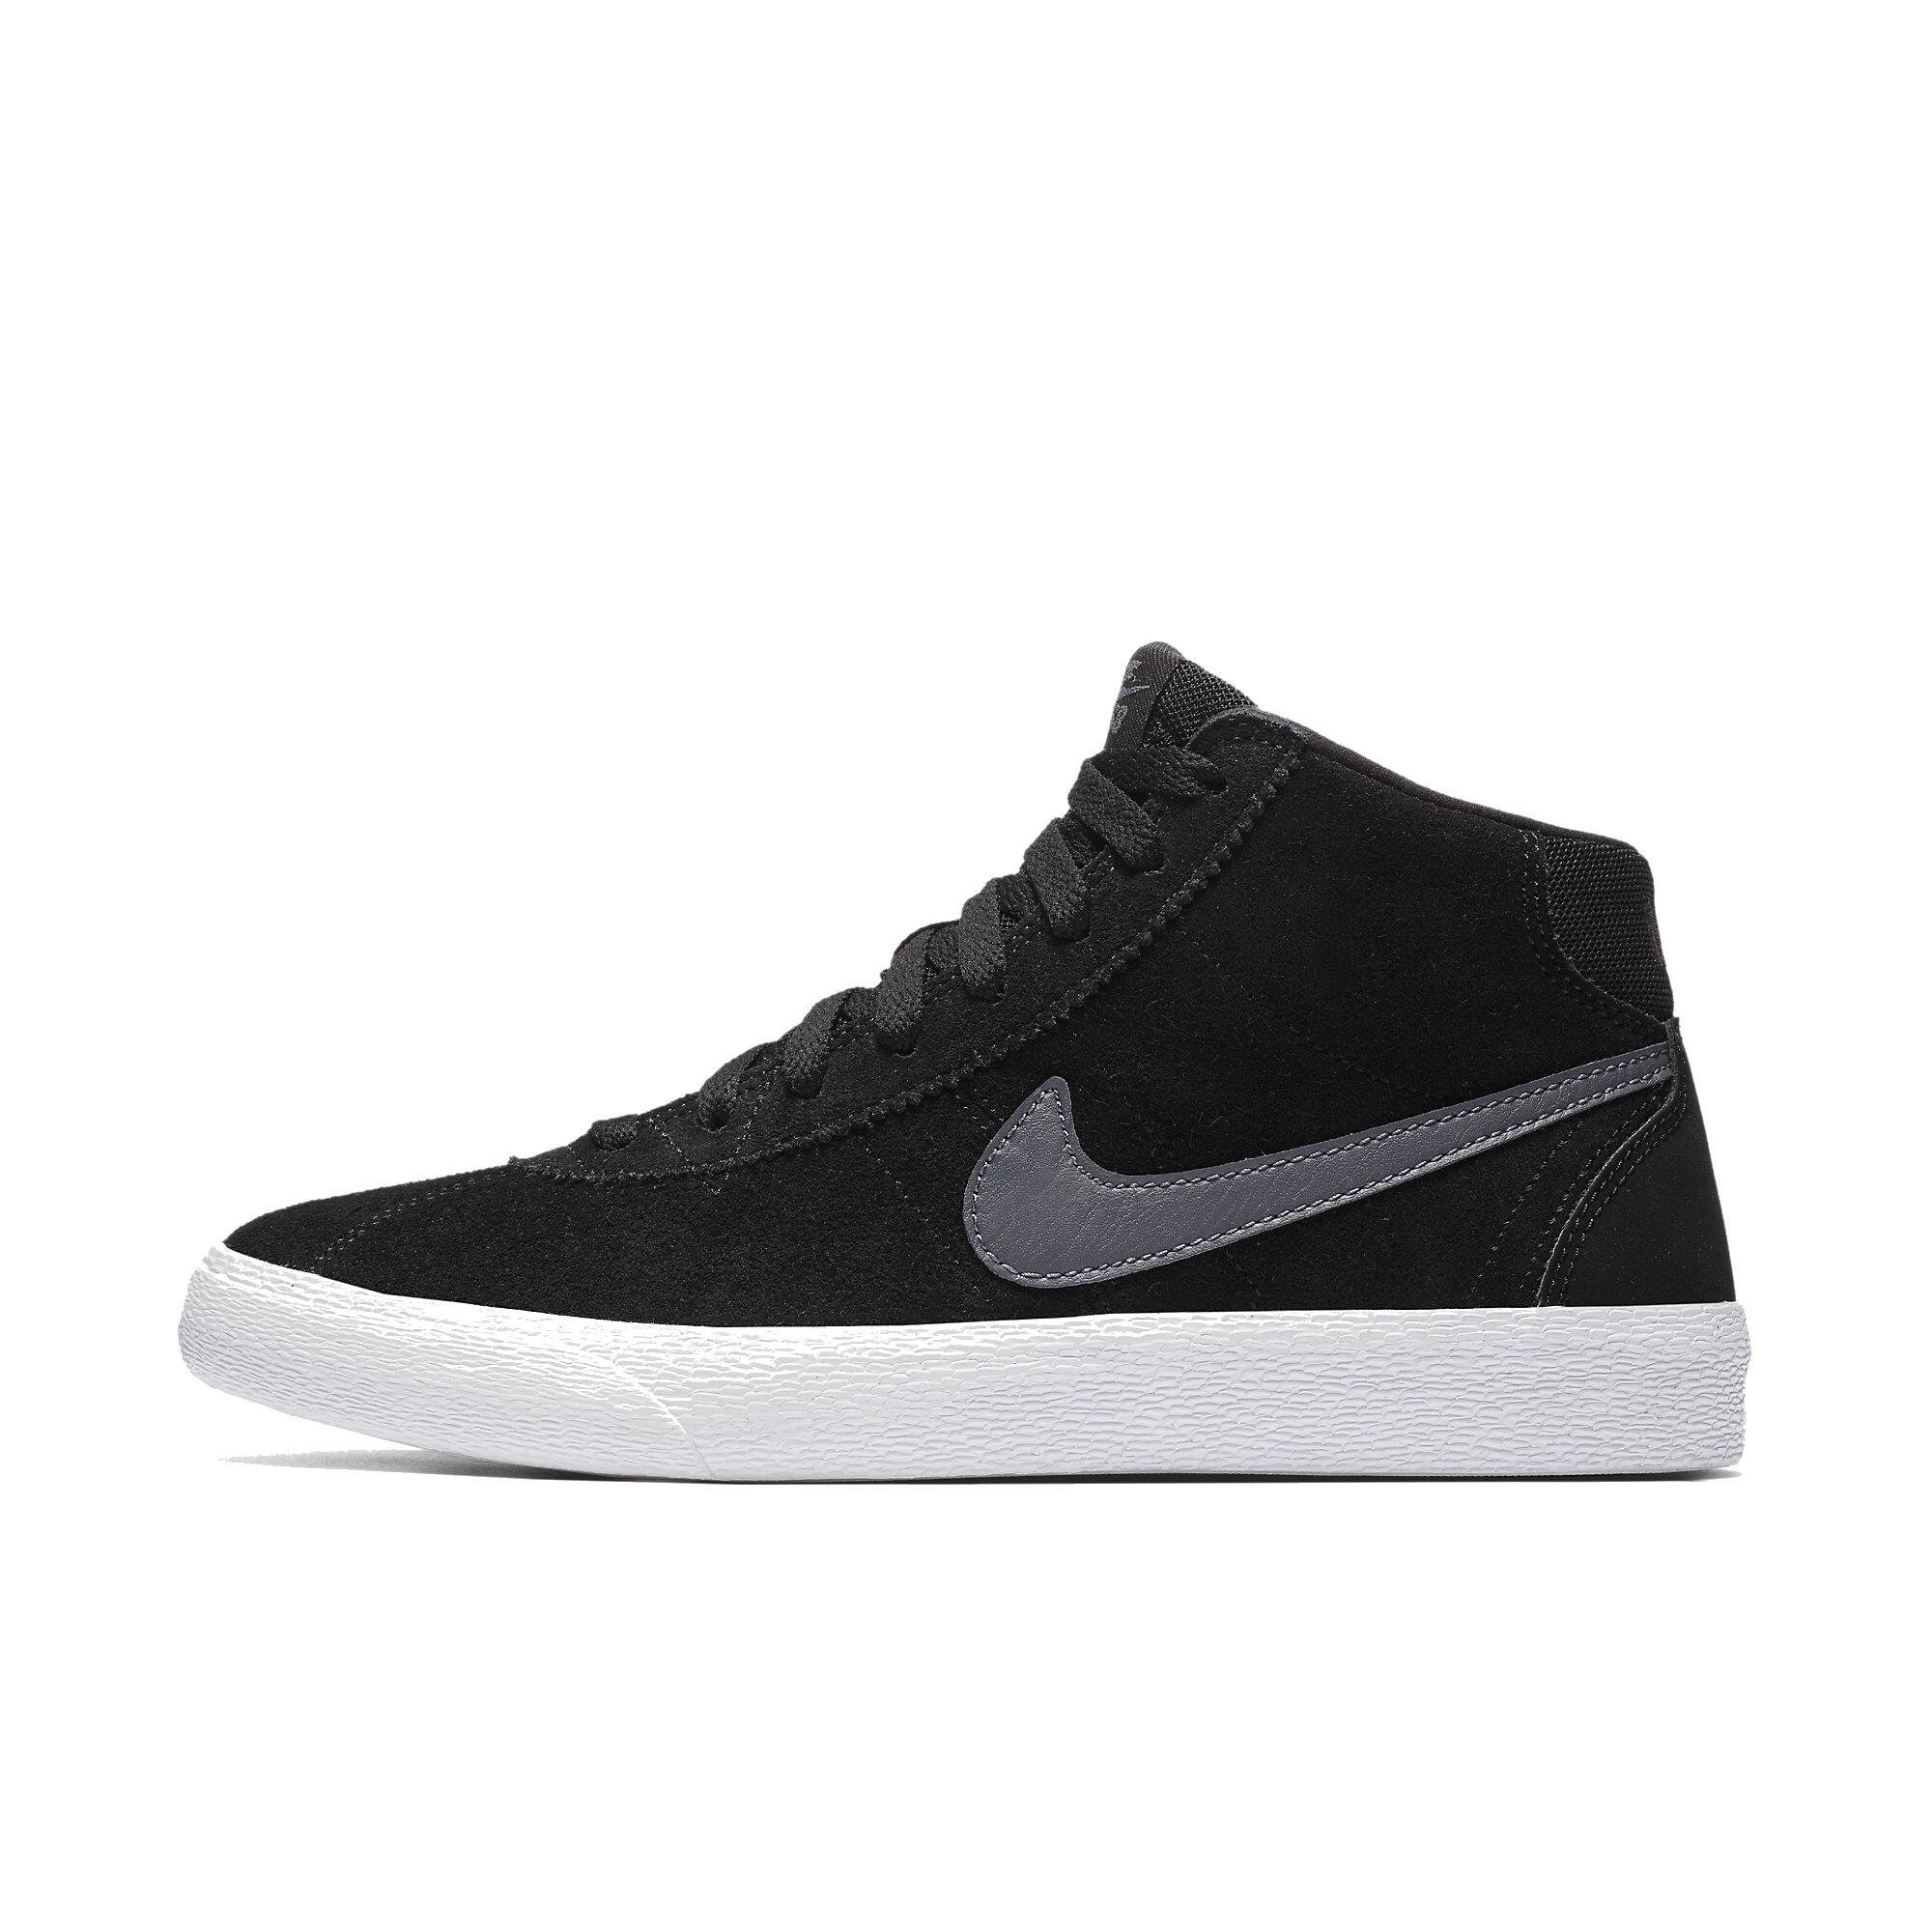 Nike Womens SB Bruin Hi (8)